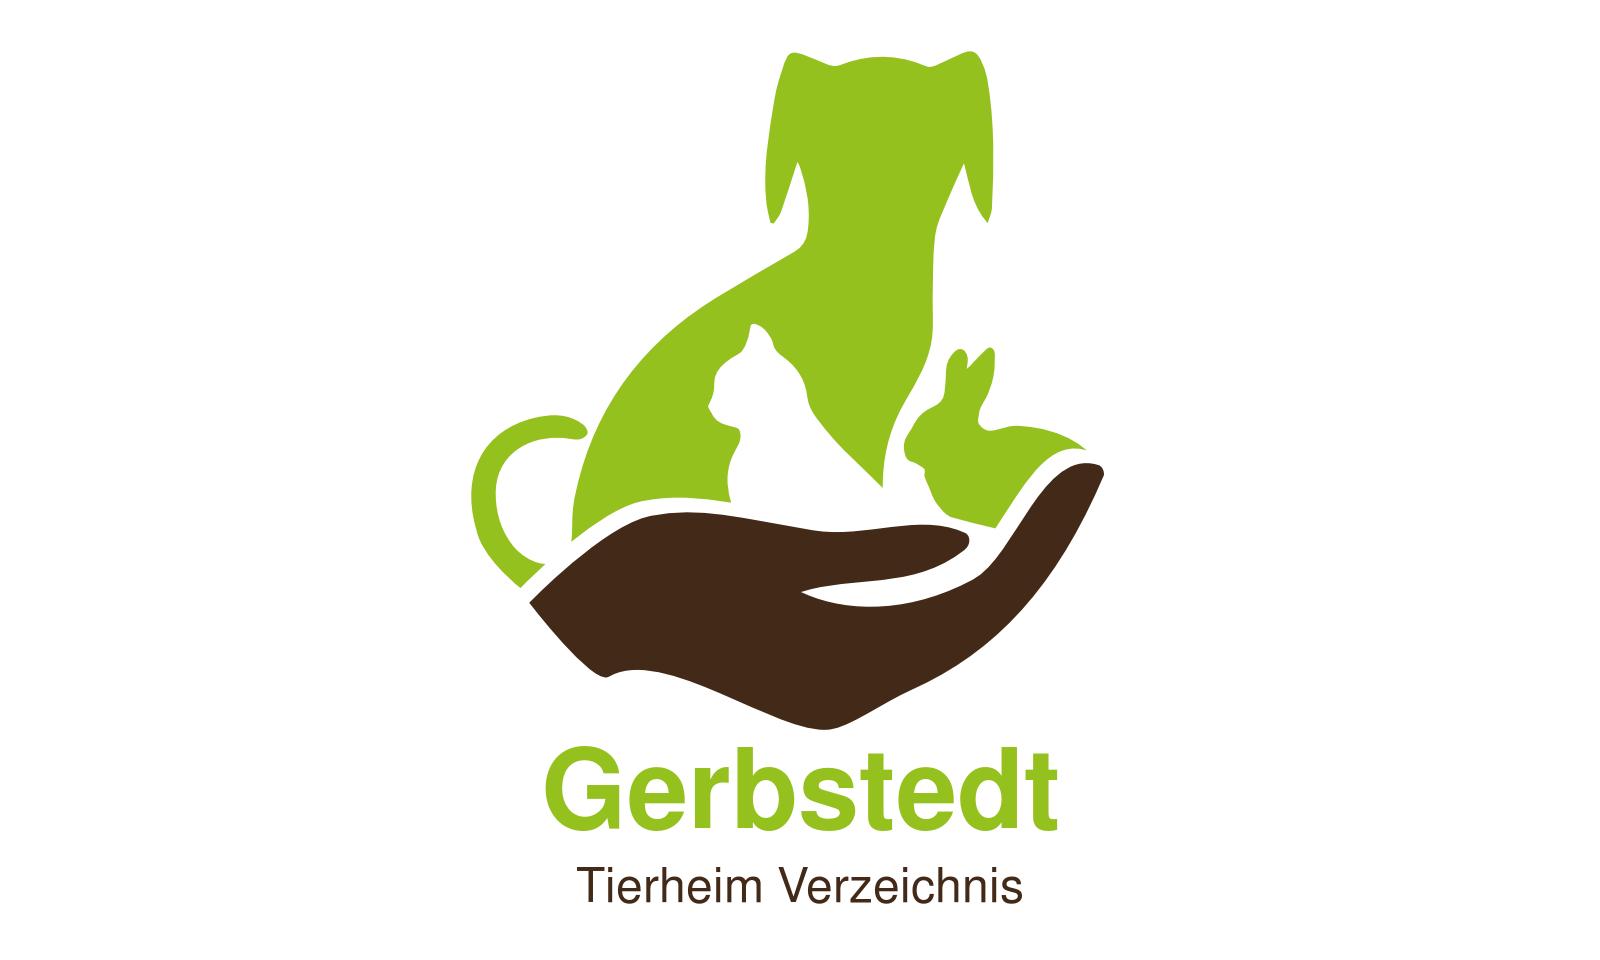 Tierheim Gerbstedt